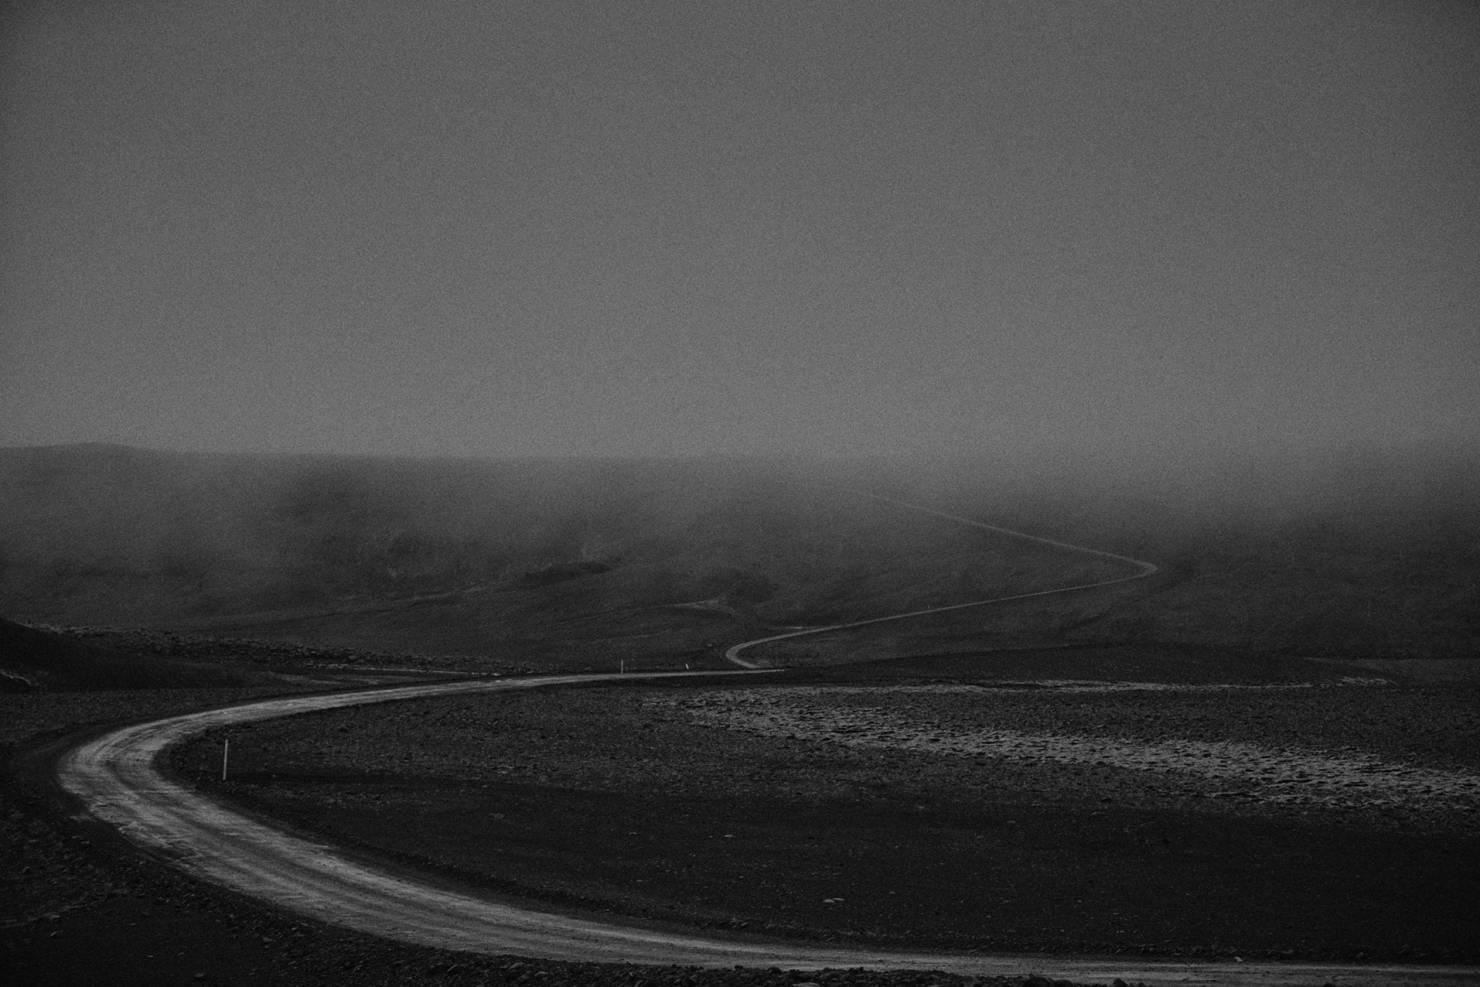 patrick_schuttler_landscape_iceland_004-842accfb2c6652eb631a92711626427b